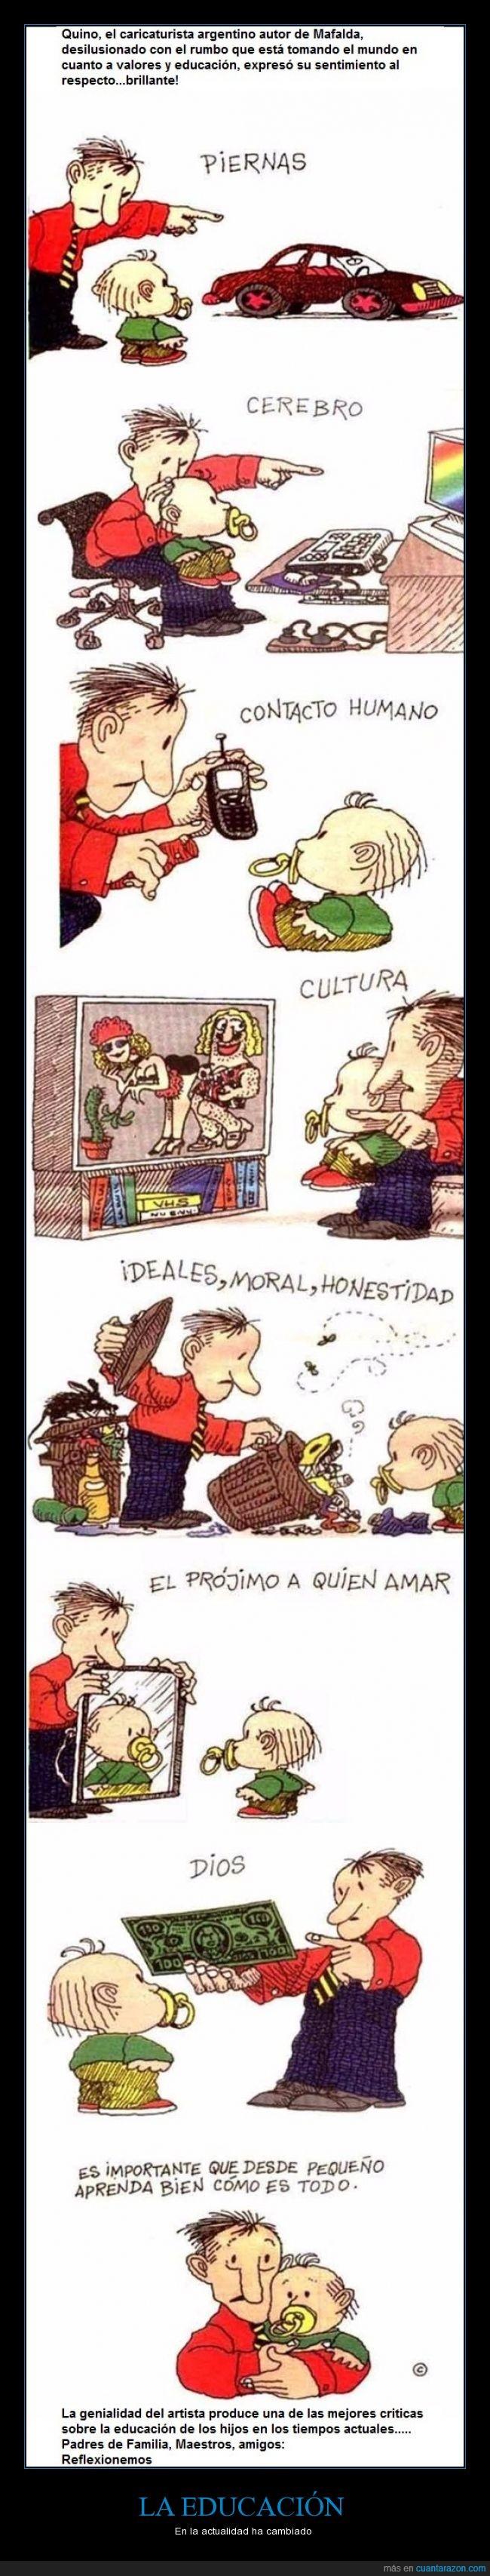 dinero,Dios,educacion,hijo,Mafalda,mundo,quino,teléfono